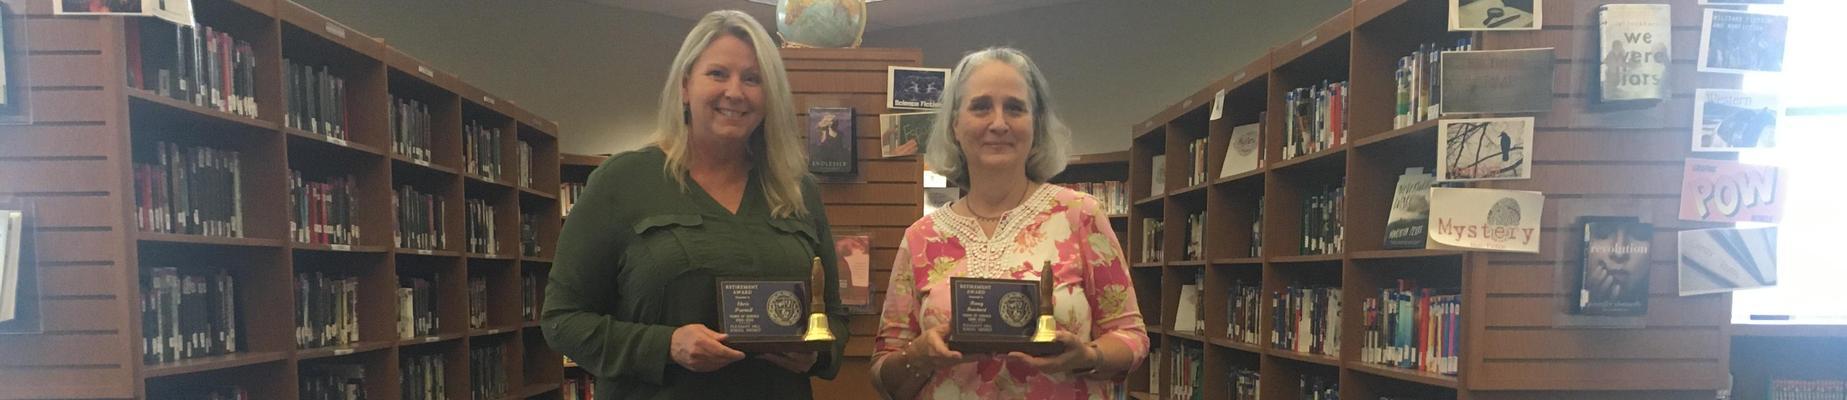 HS Honors Retirees